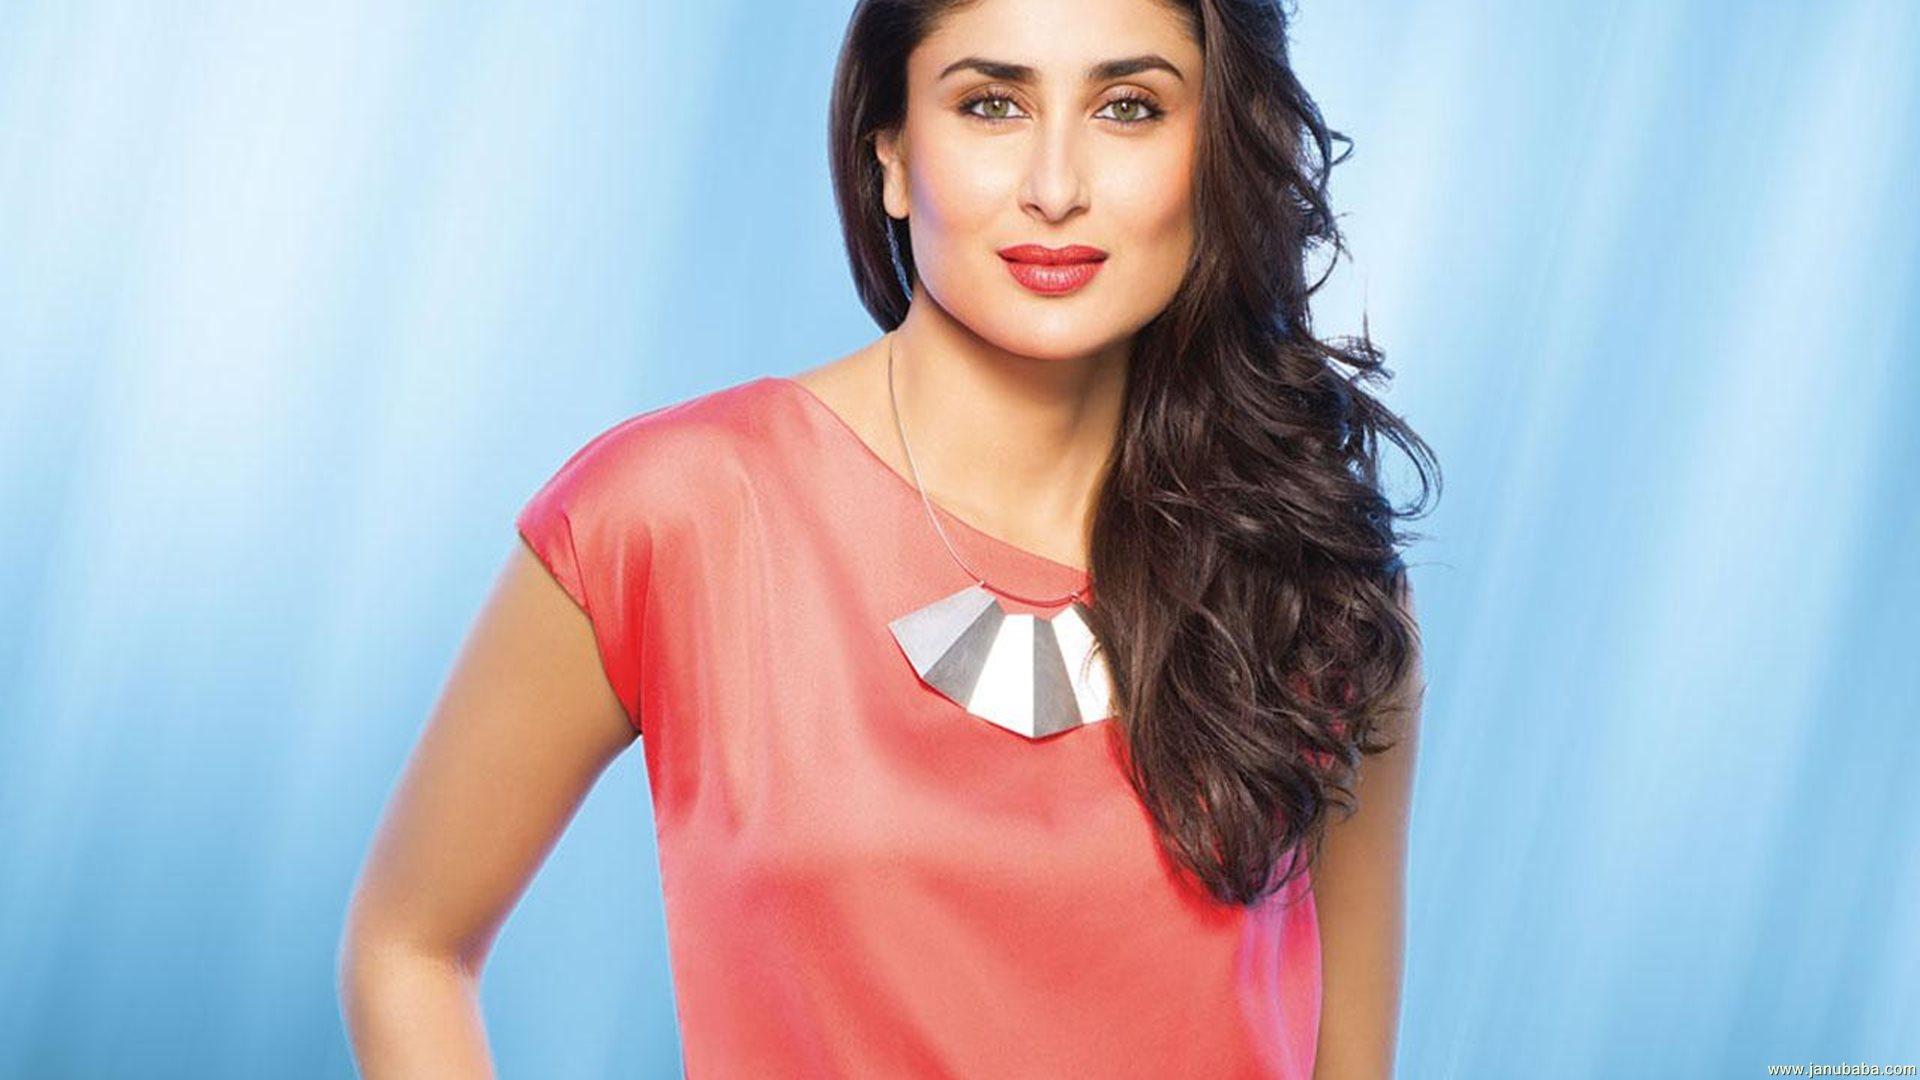 3d Wallpapers In Mumbai Kareena Kapoor Wallpapers Pictures Images